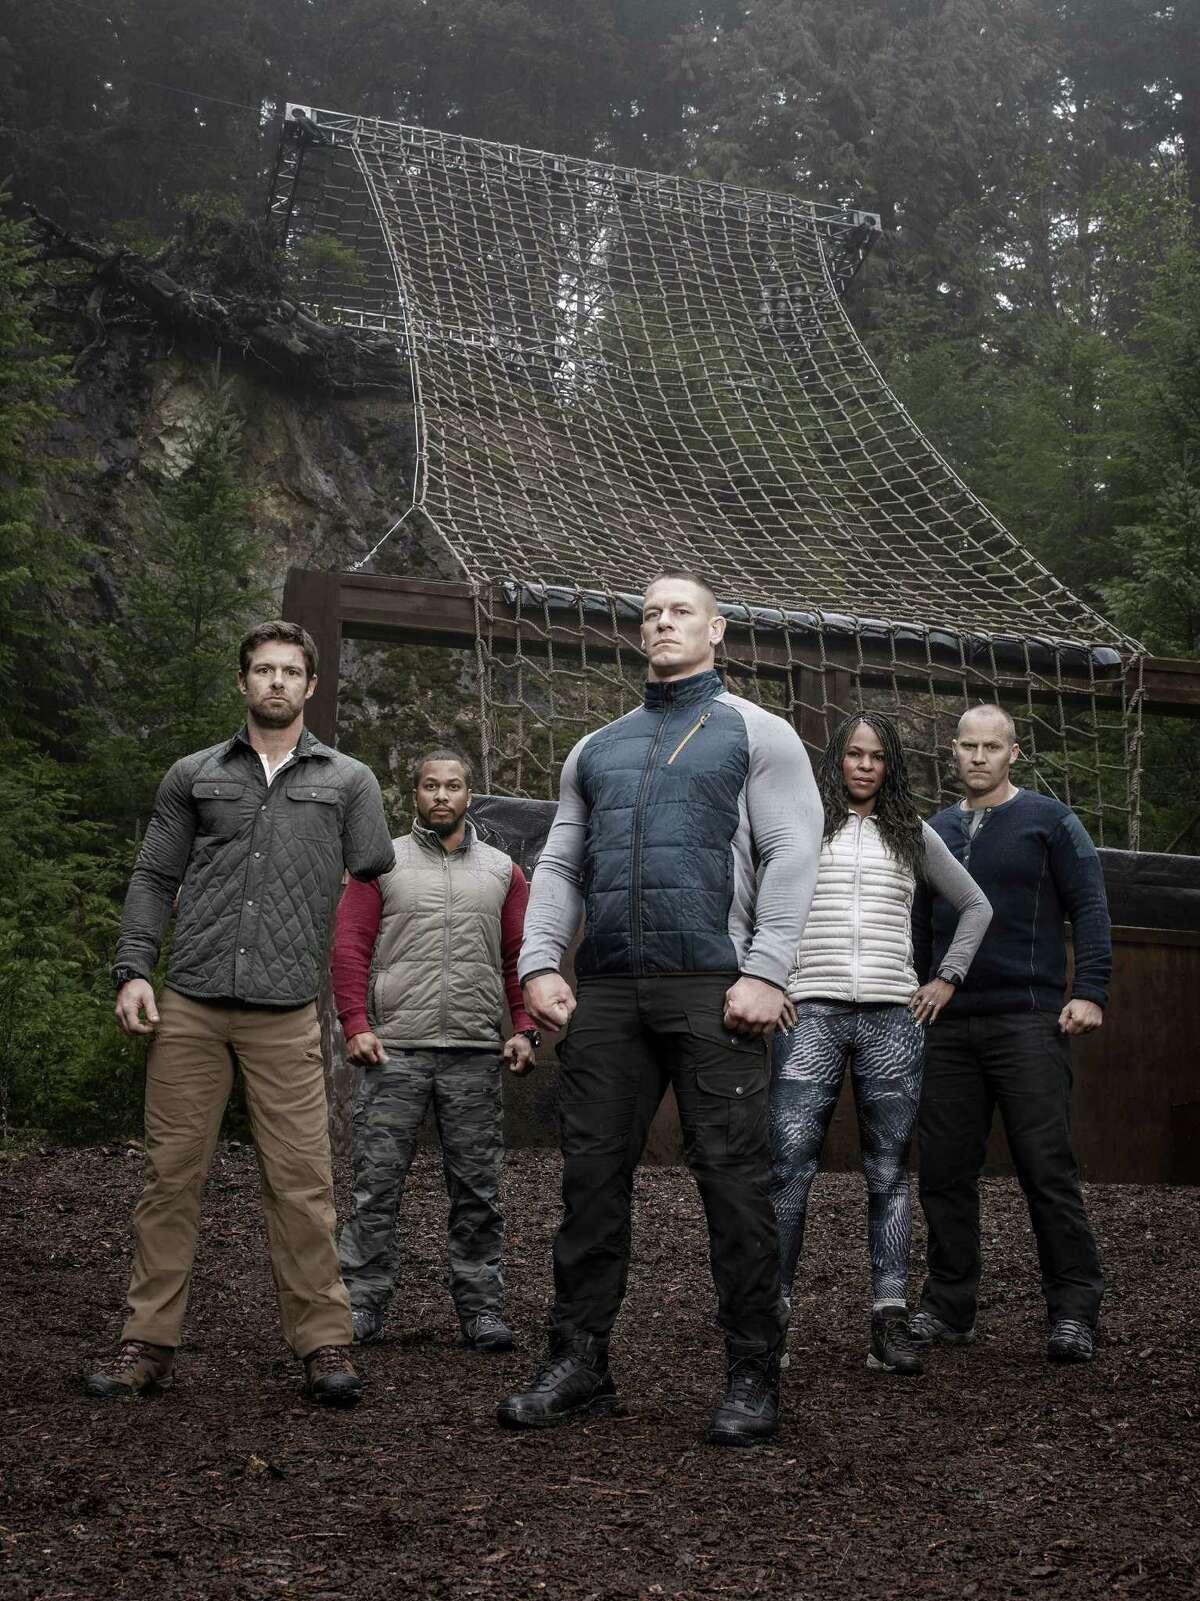 Host John Cena is flanked by military mentors Noah Galloway, Nick ?